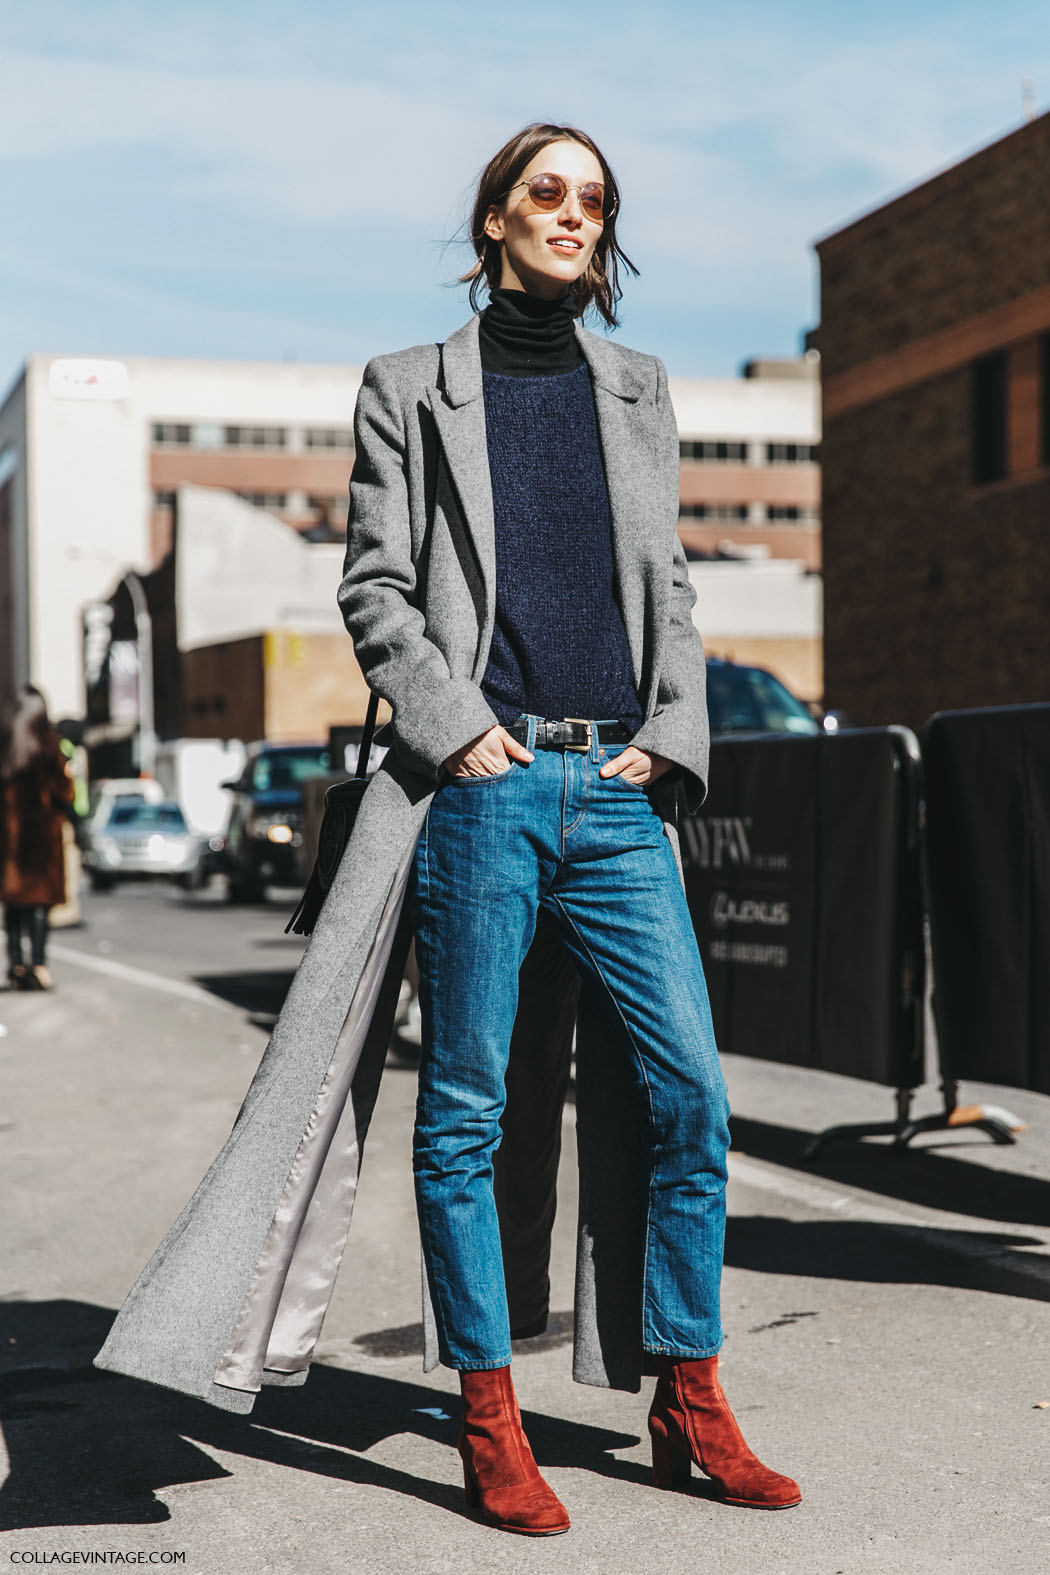 NYFW-New_York_Fashion_Week-Fall_Winter-17-Street_Style-Model-Grey_Long_Coat-Jeans-2